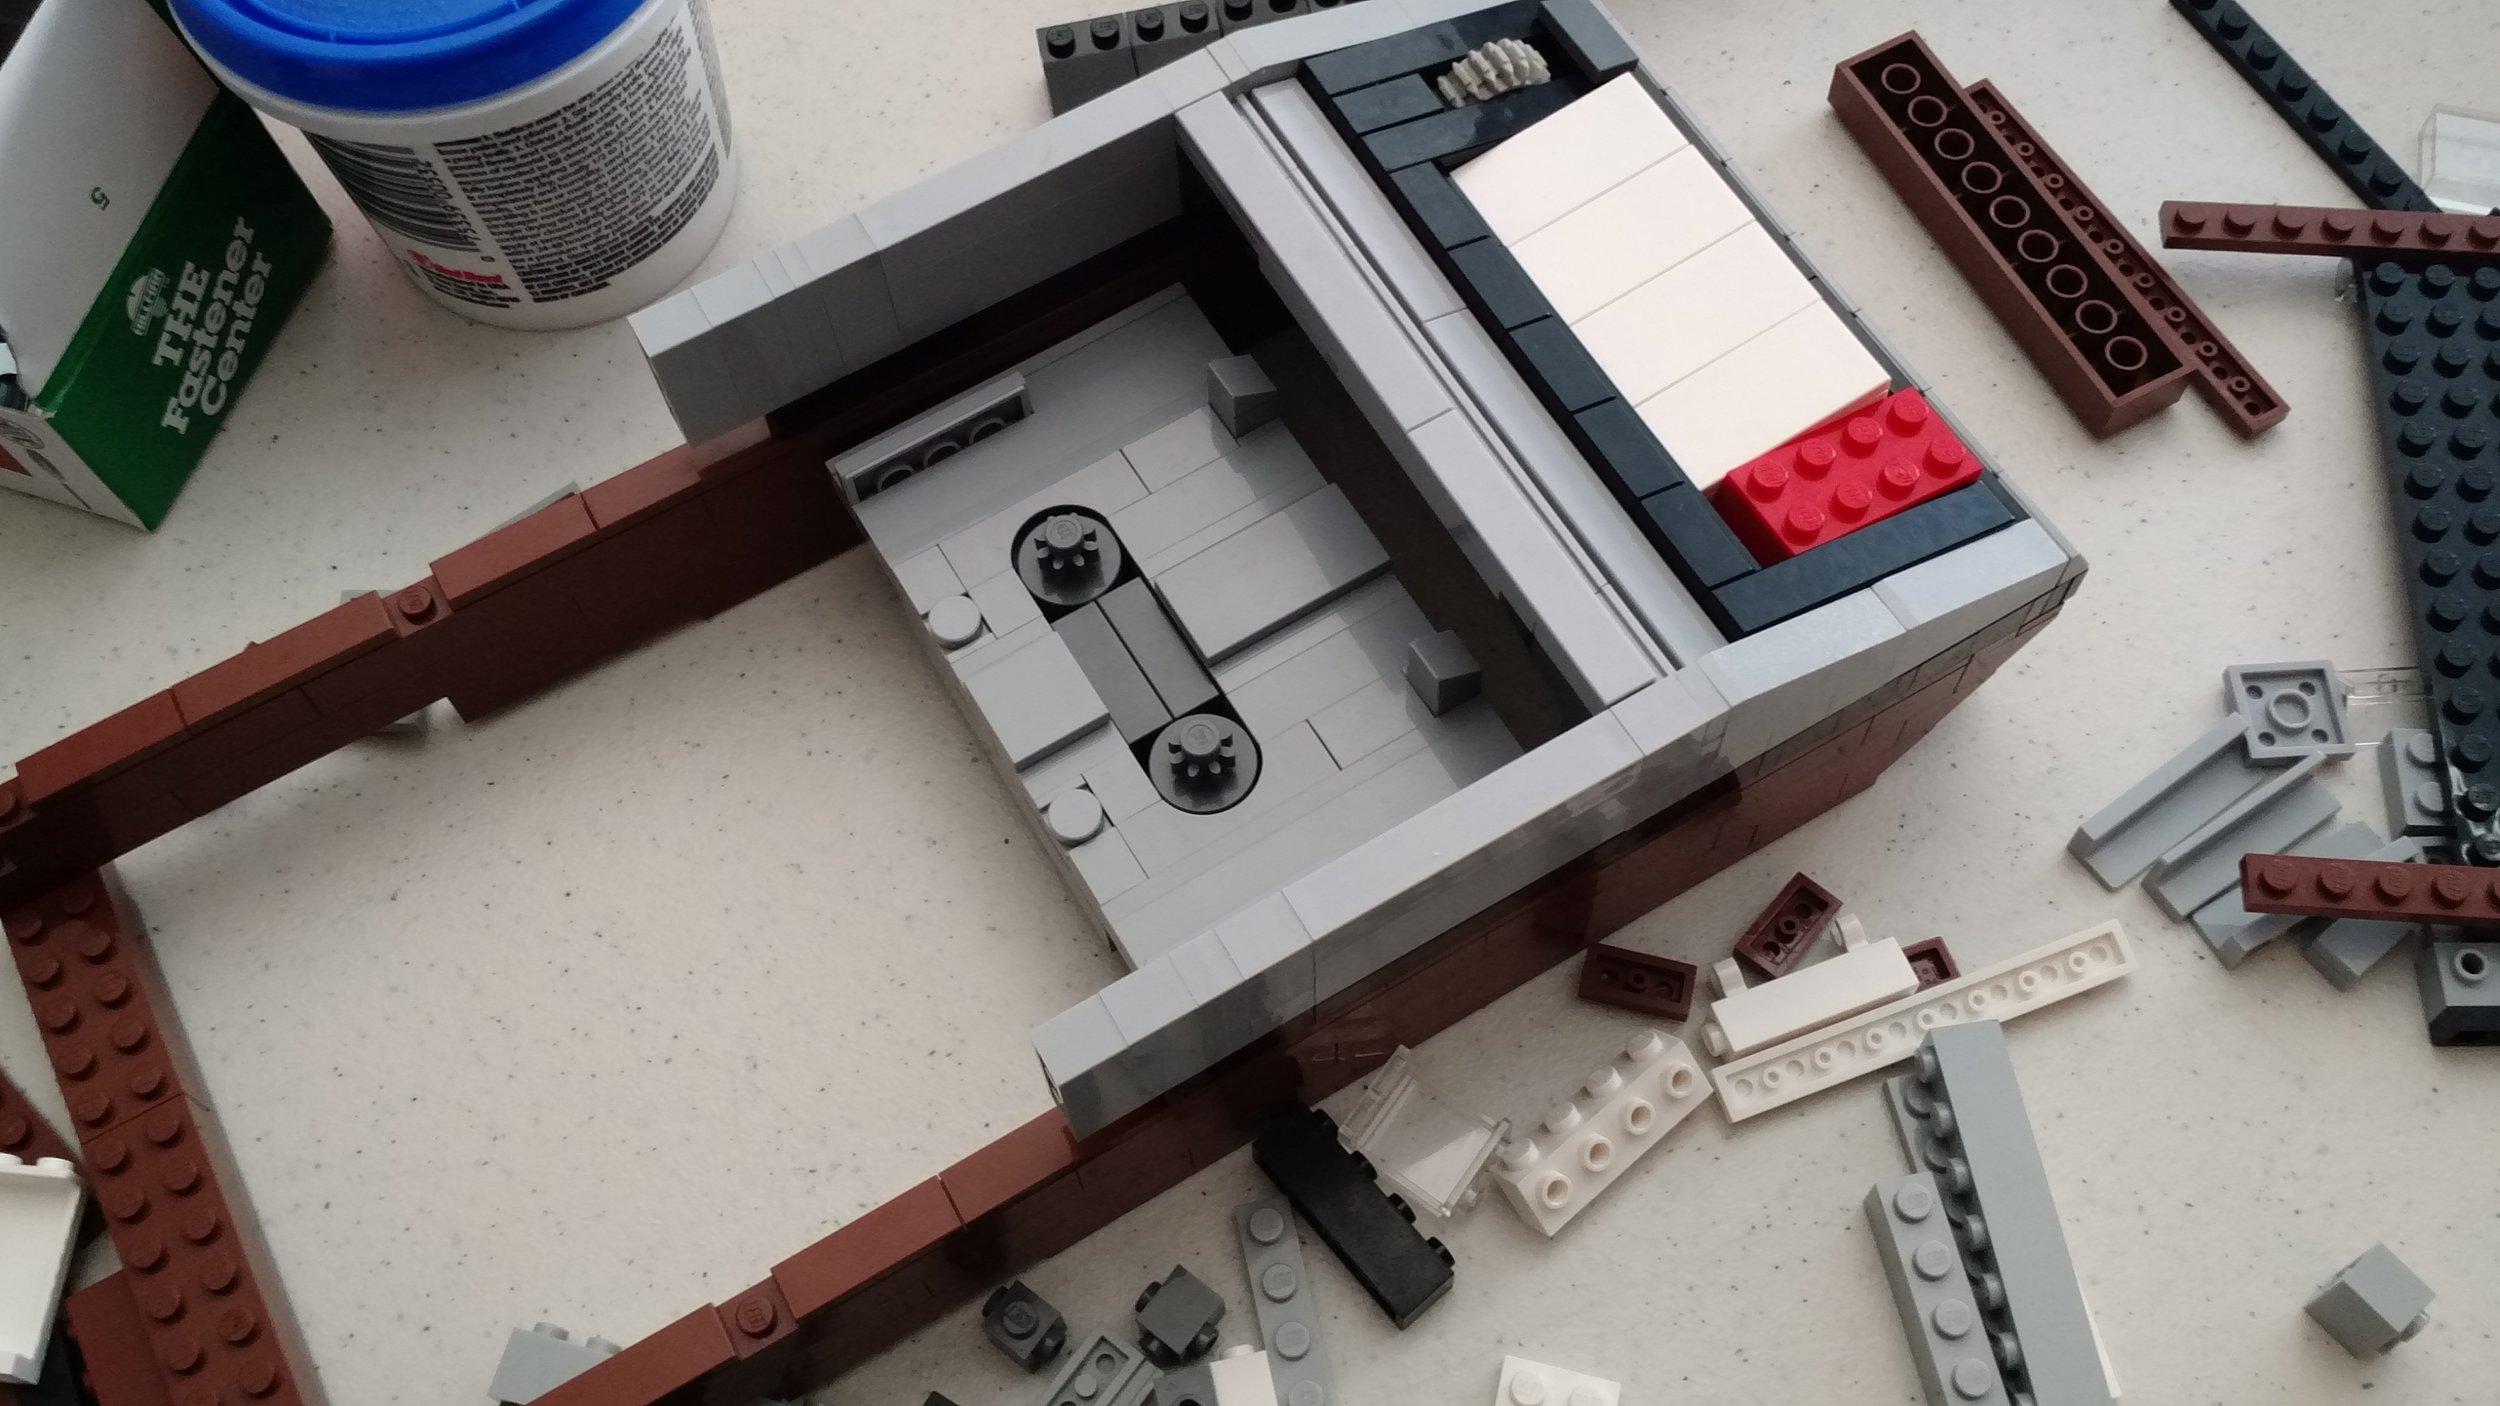 The cassette tape recorder takes shape